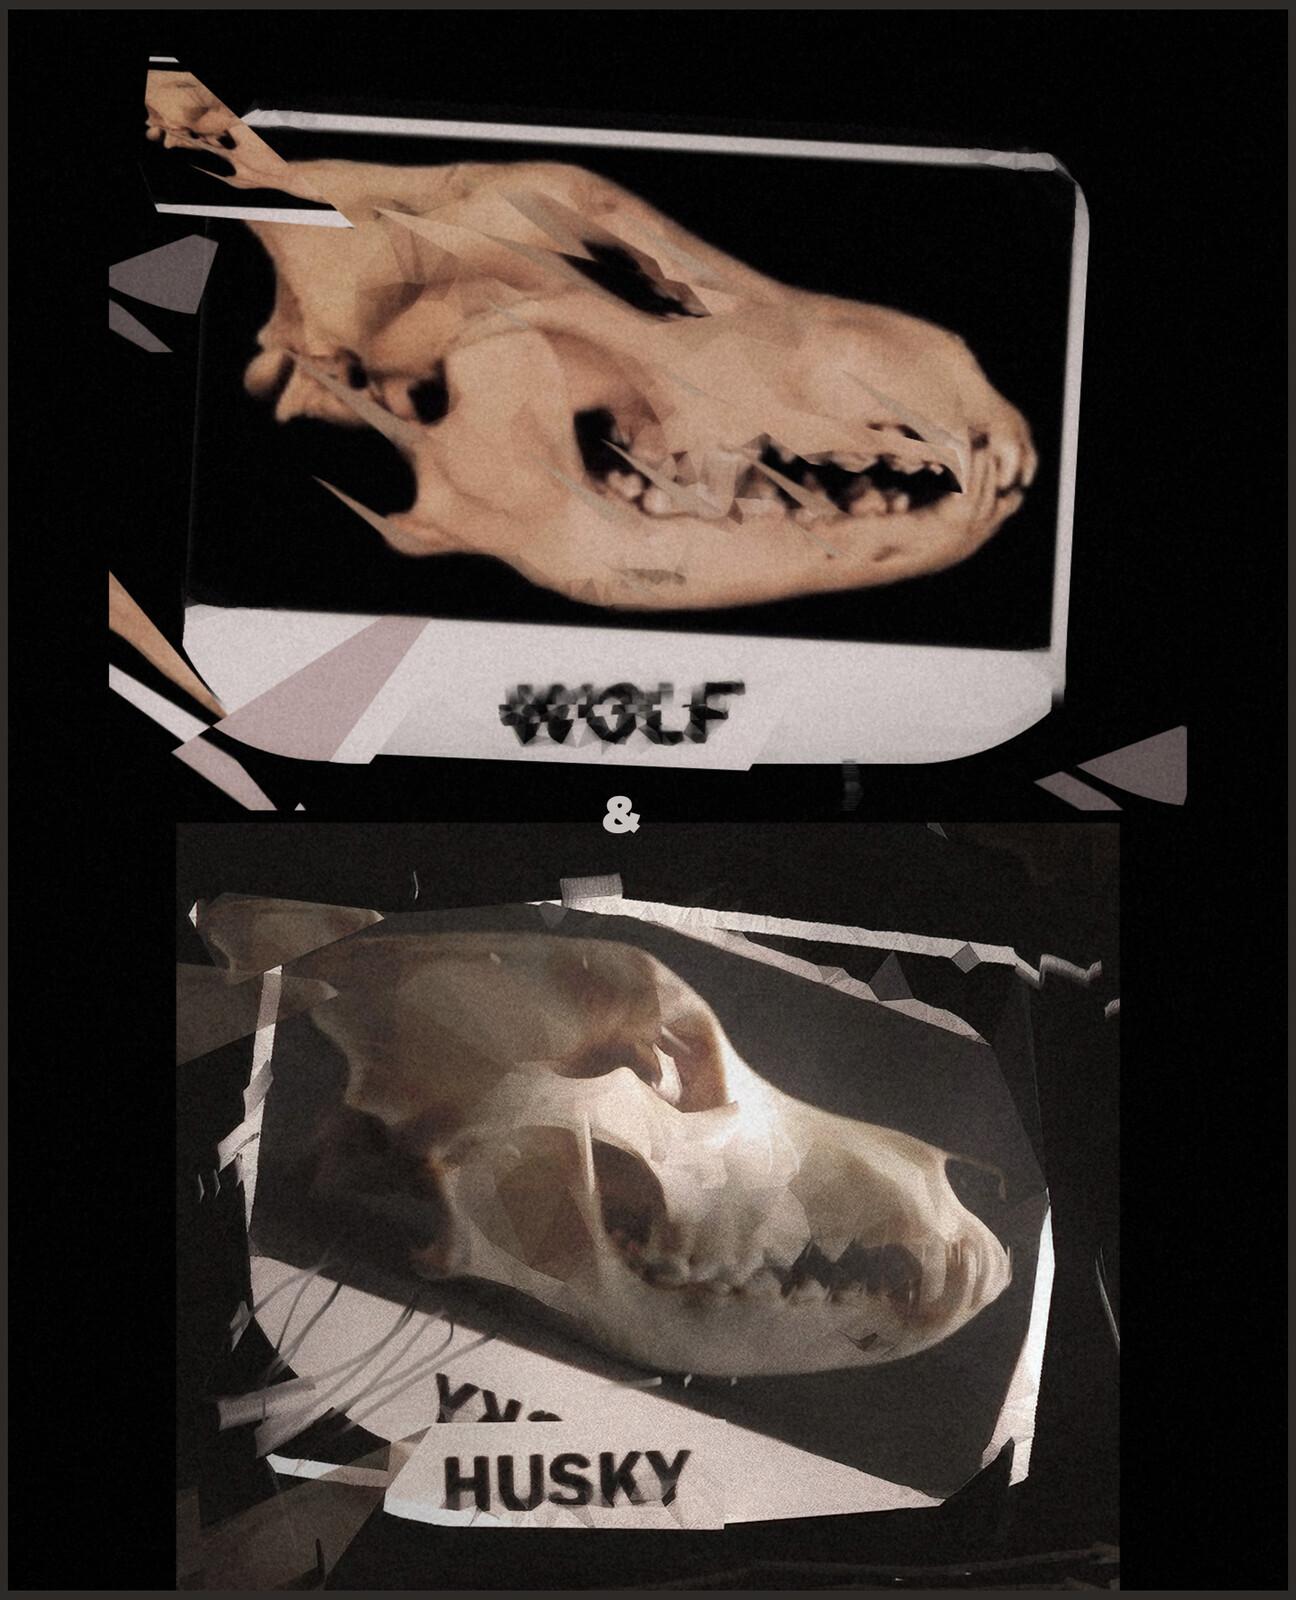 WOLF & HUSKY